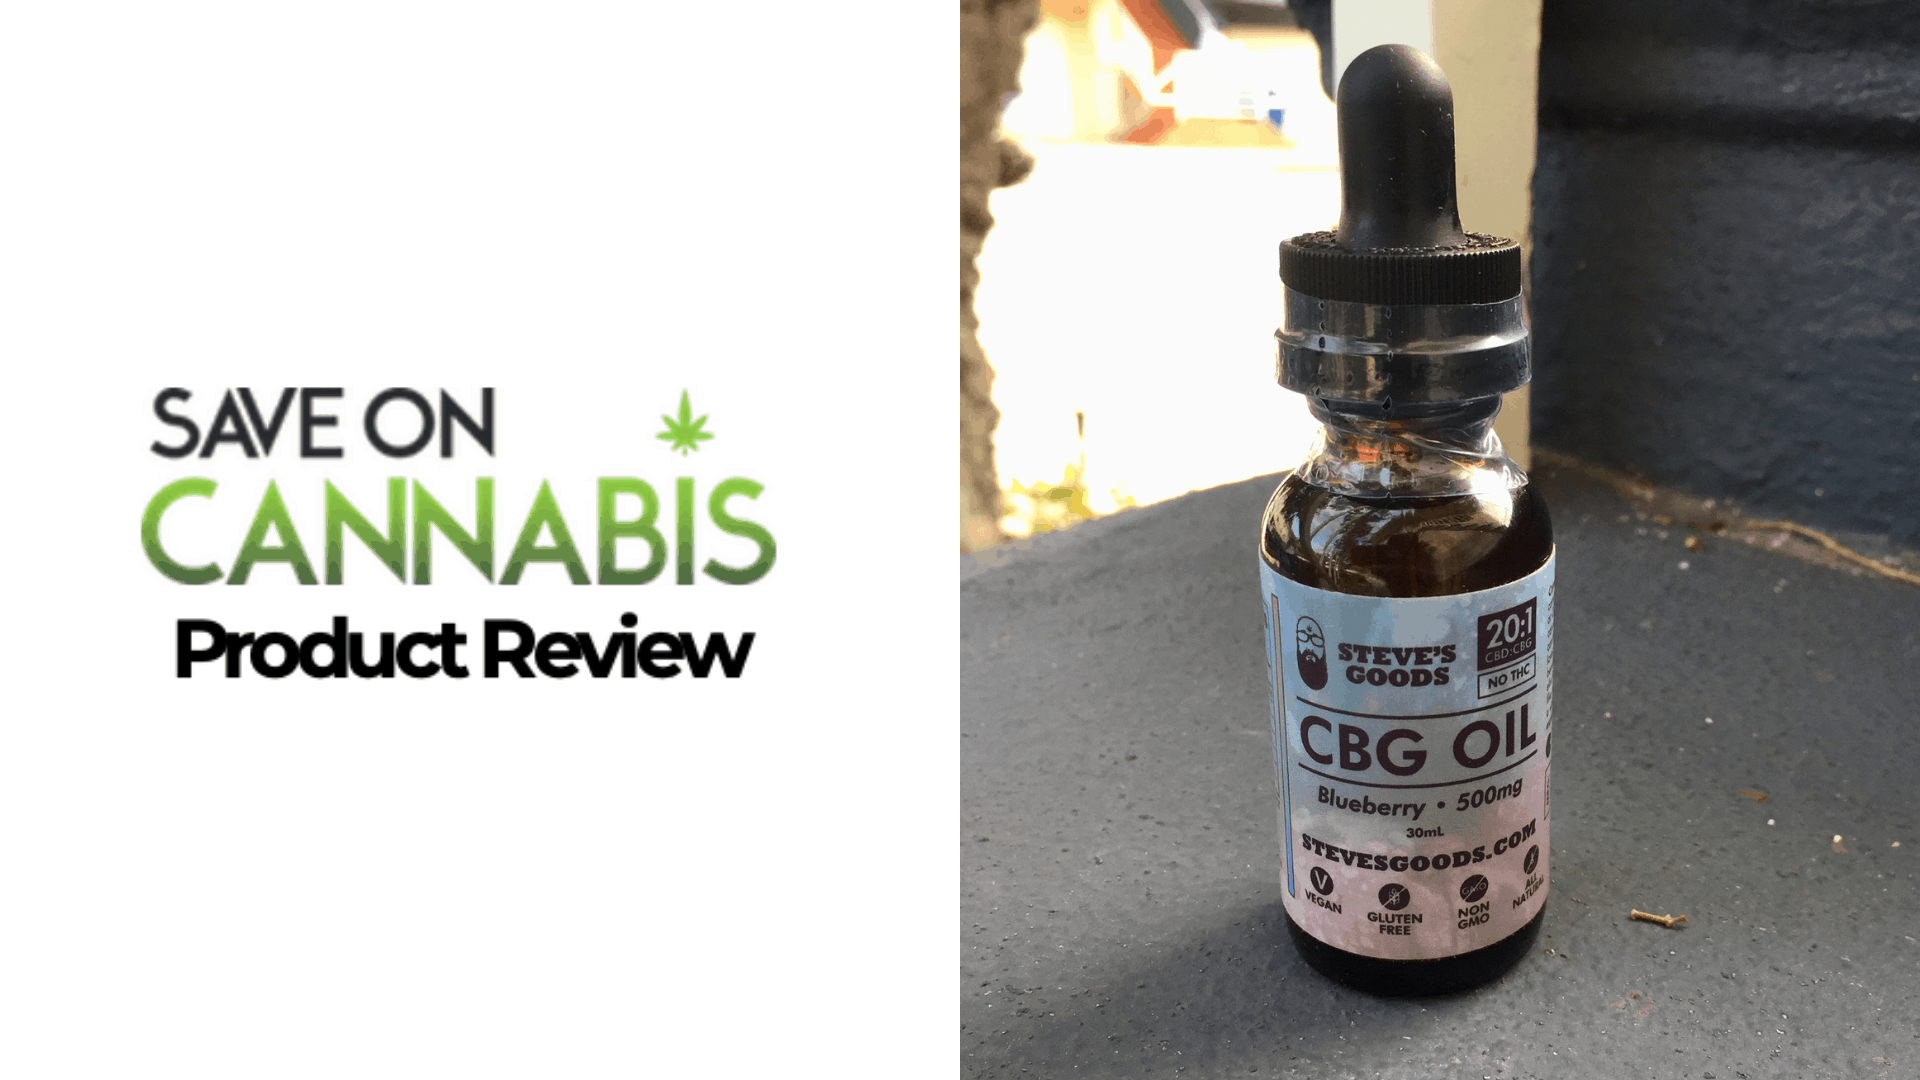 steves goods cbd cbg blueberry oil 20 1 500 mg Save On Cannabis Website